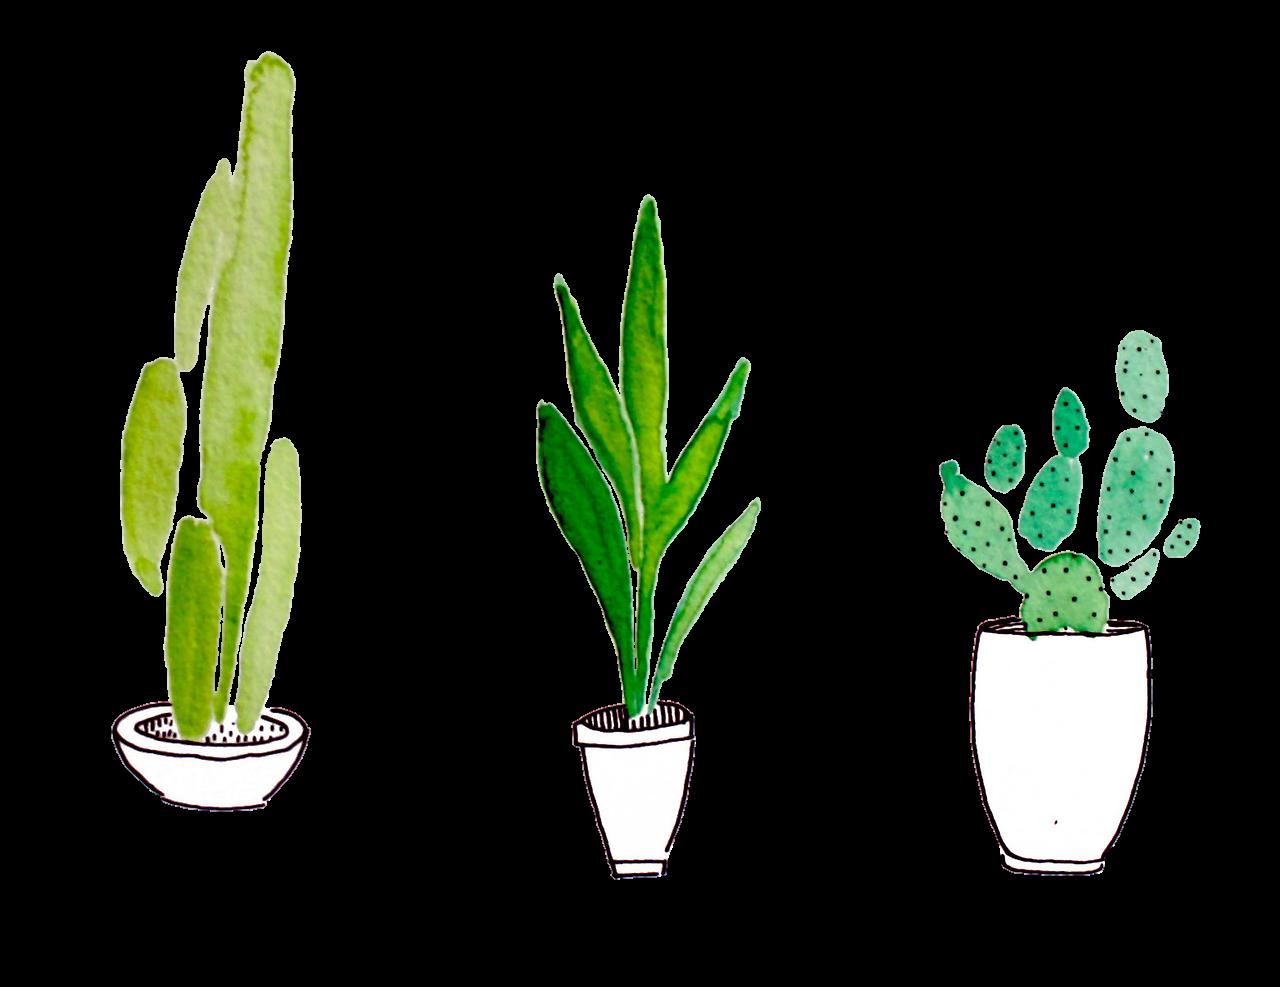 vector free download Plant drawing at getdrawings. Cactus clipart cholla.